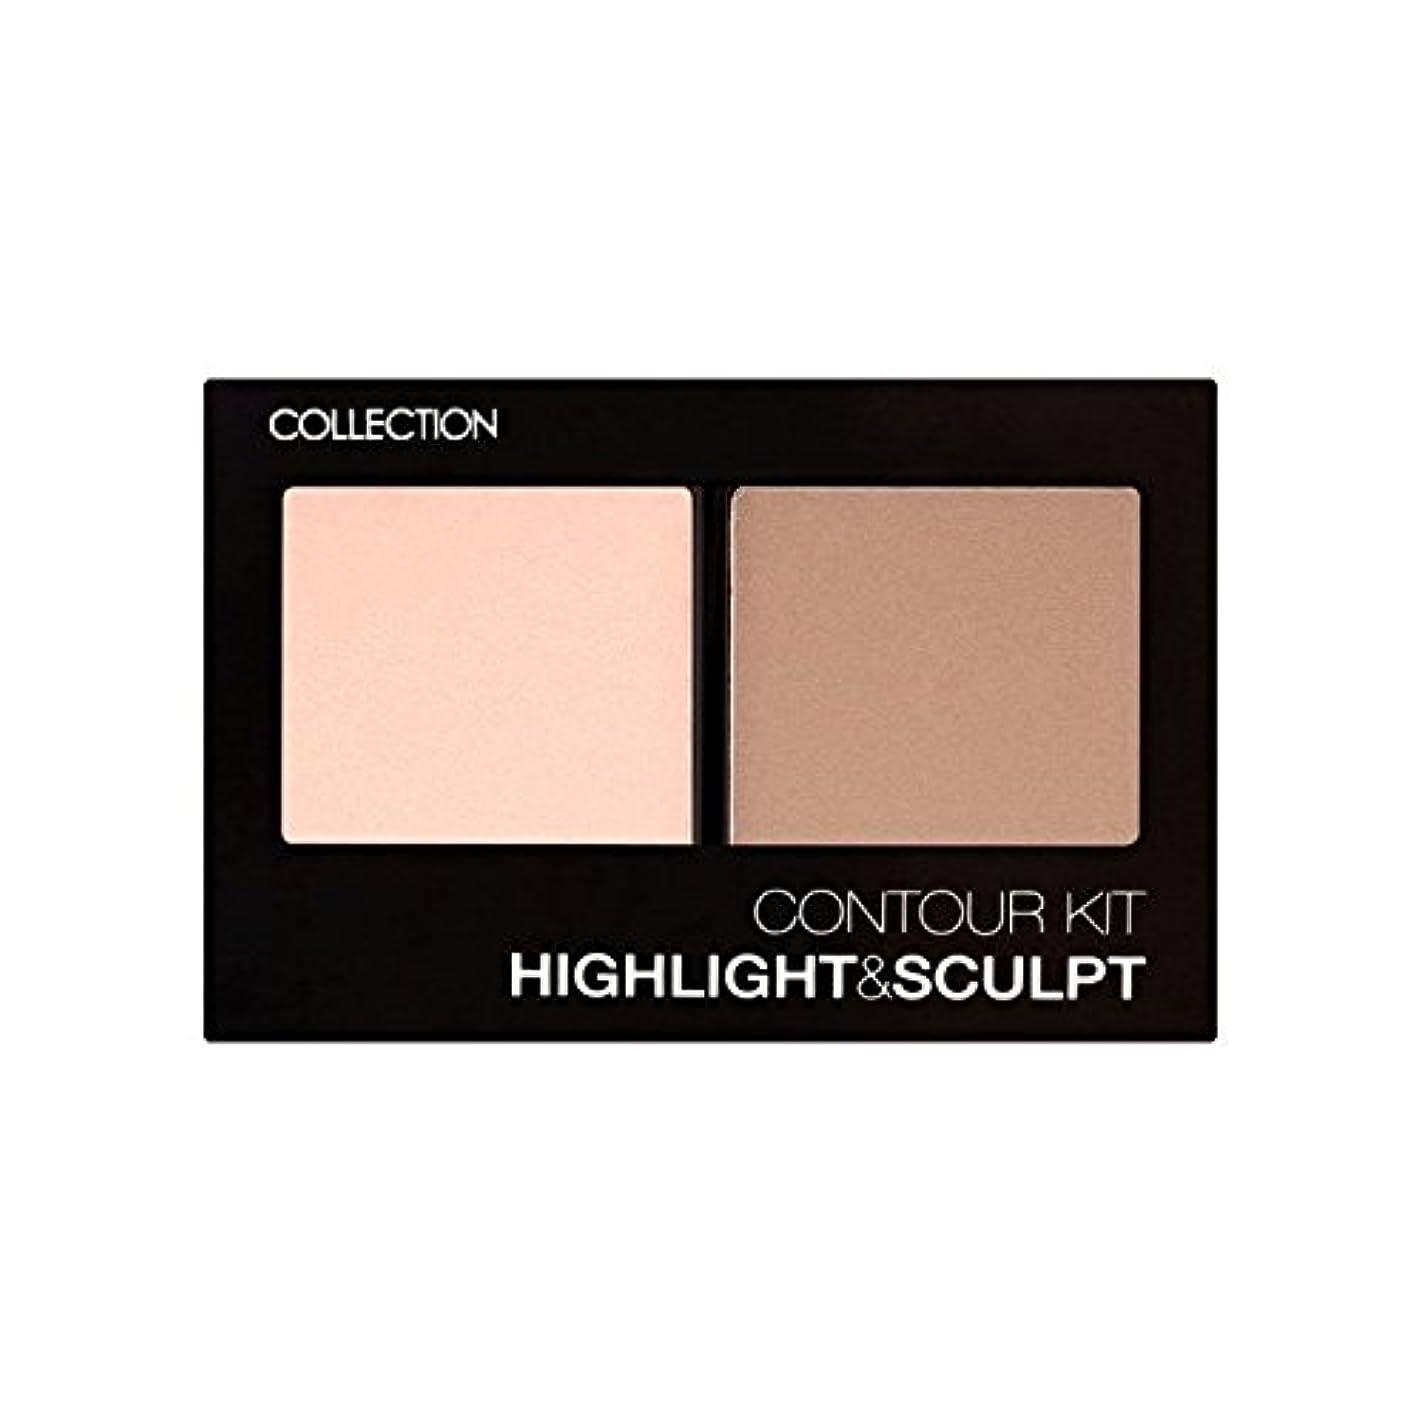 Collection Contour Kit Contour Kit 1 - コレクション、輪郭キット輪郭キット1 [並行輸入品]